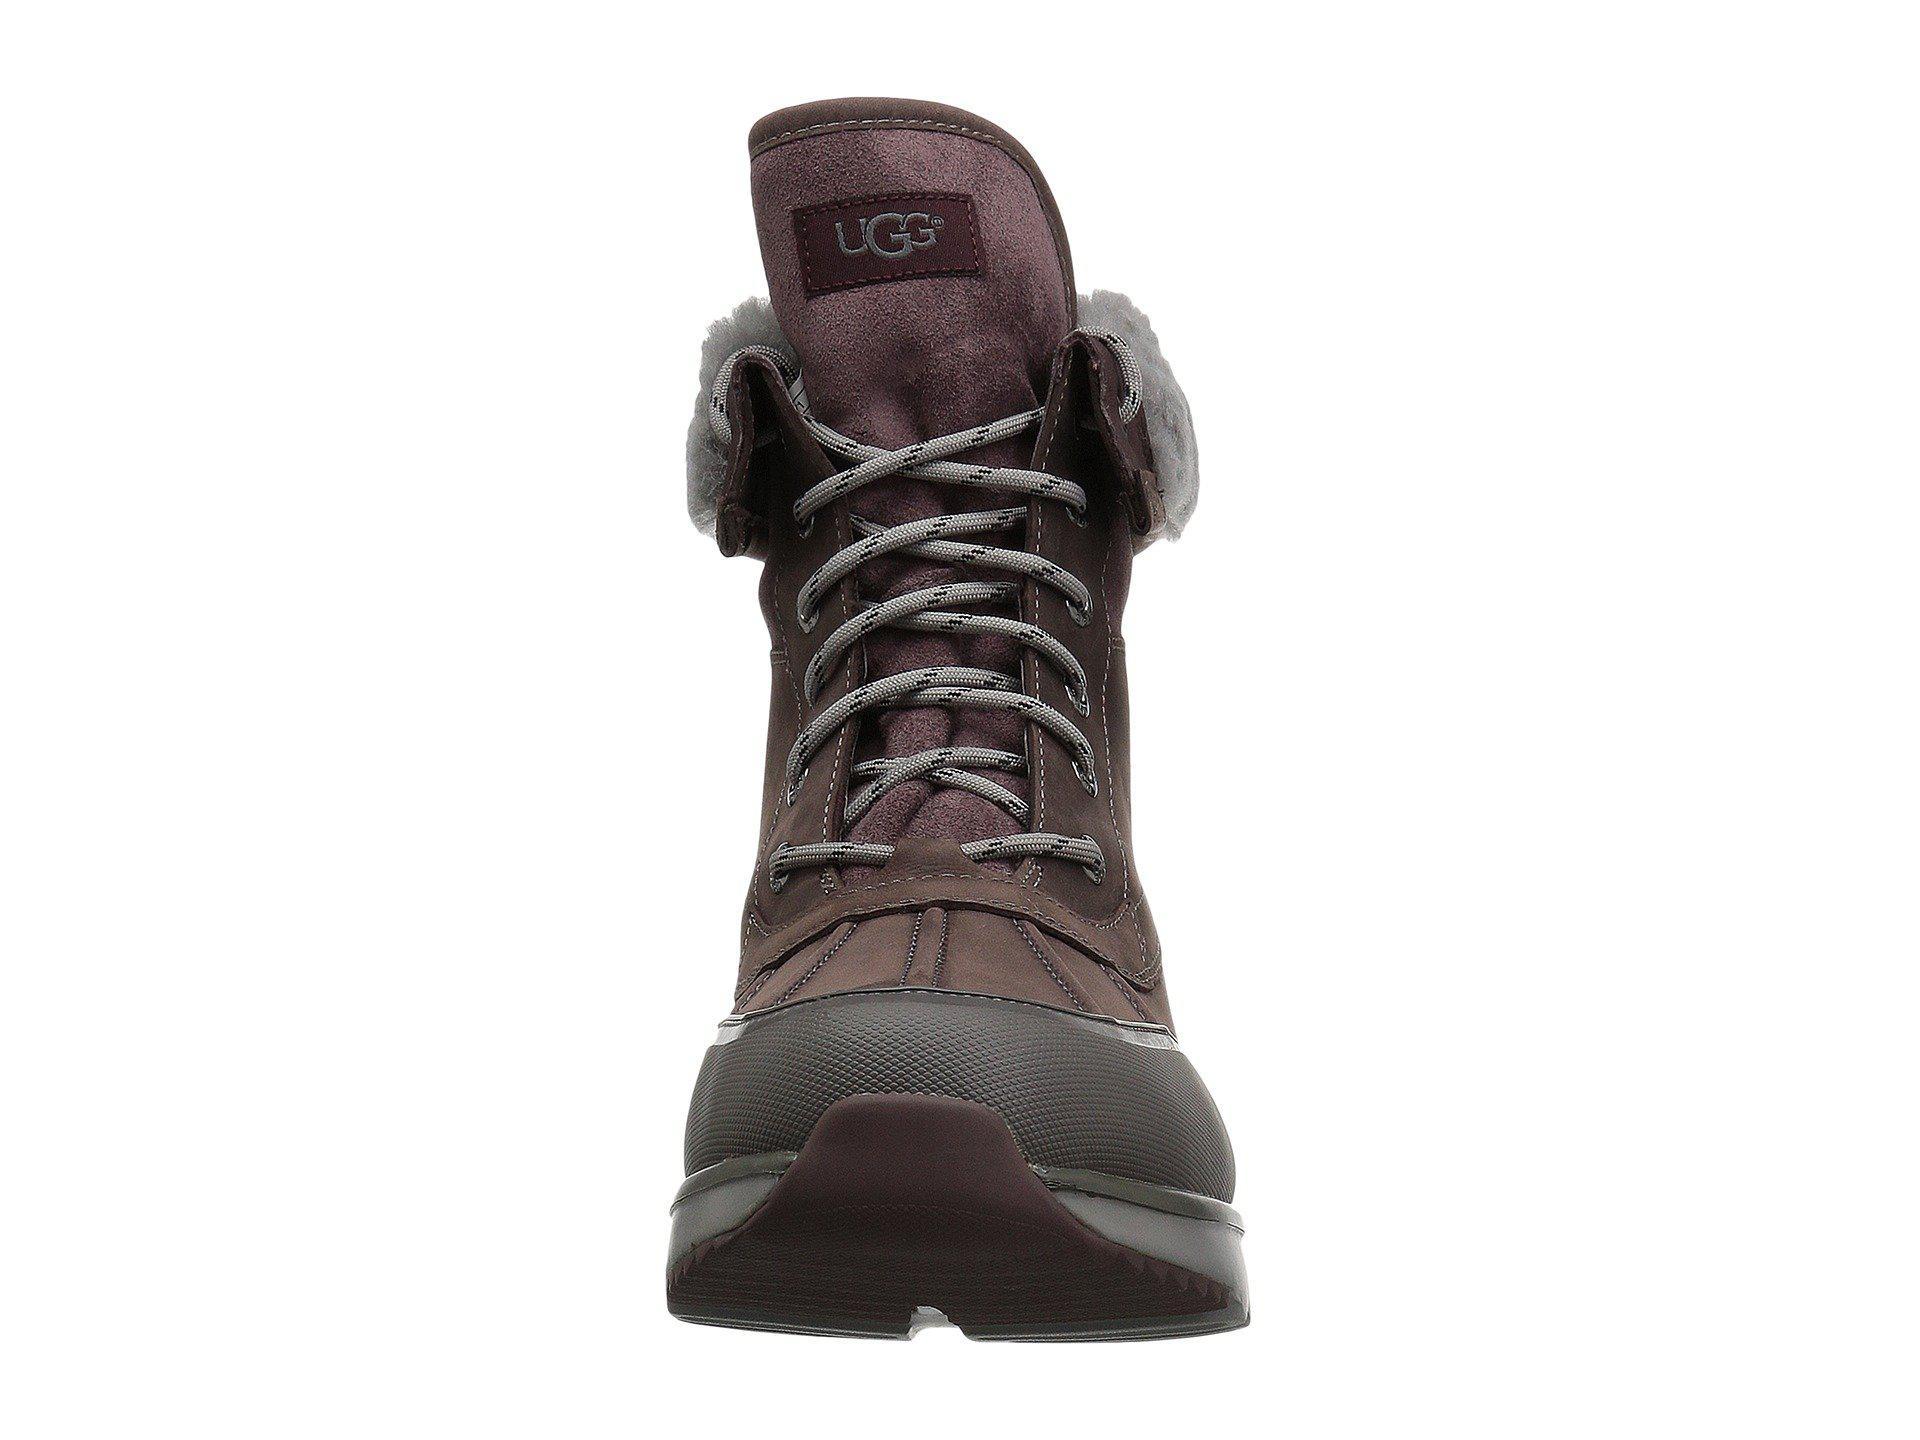 58457b1a327 Ugg Brown Eliasson (cordovan) Men's Boots for men